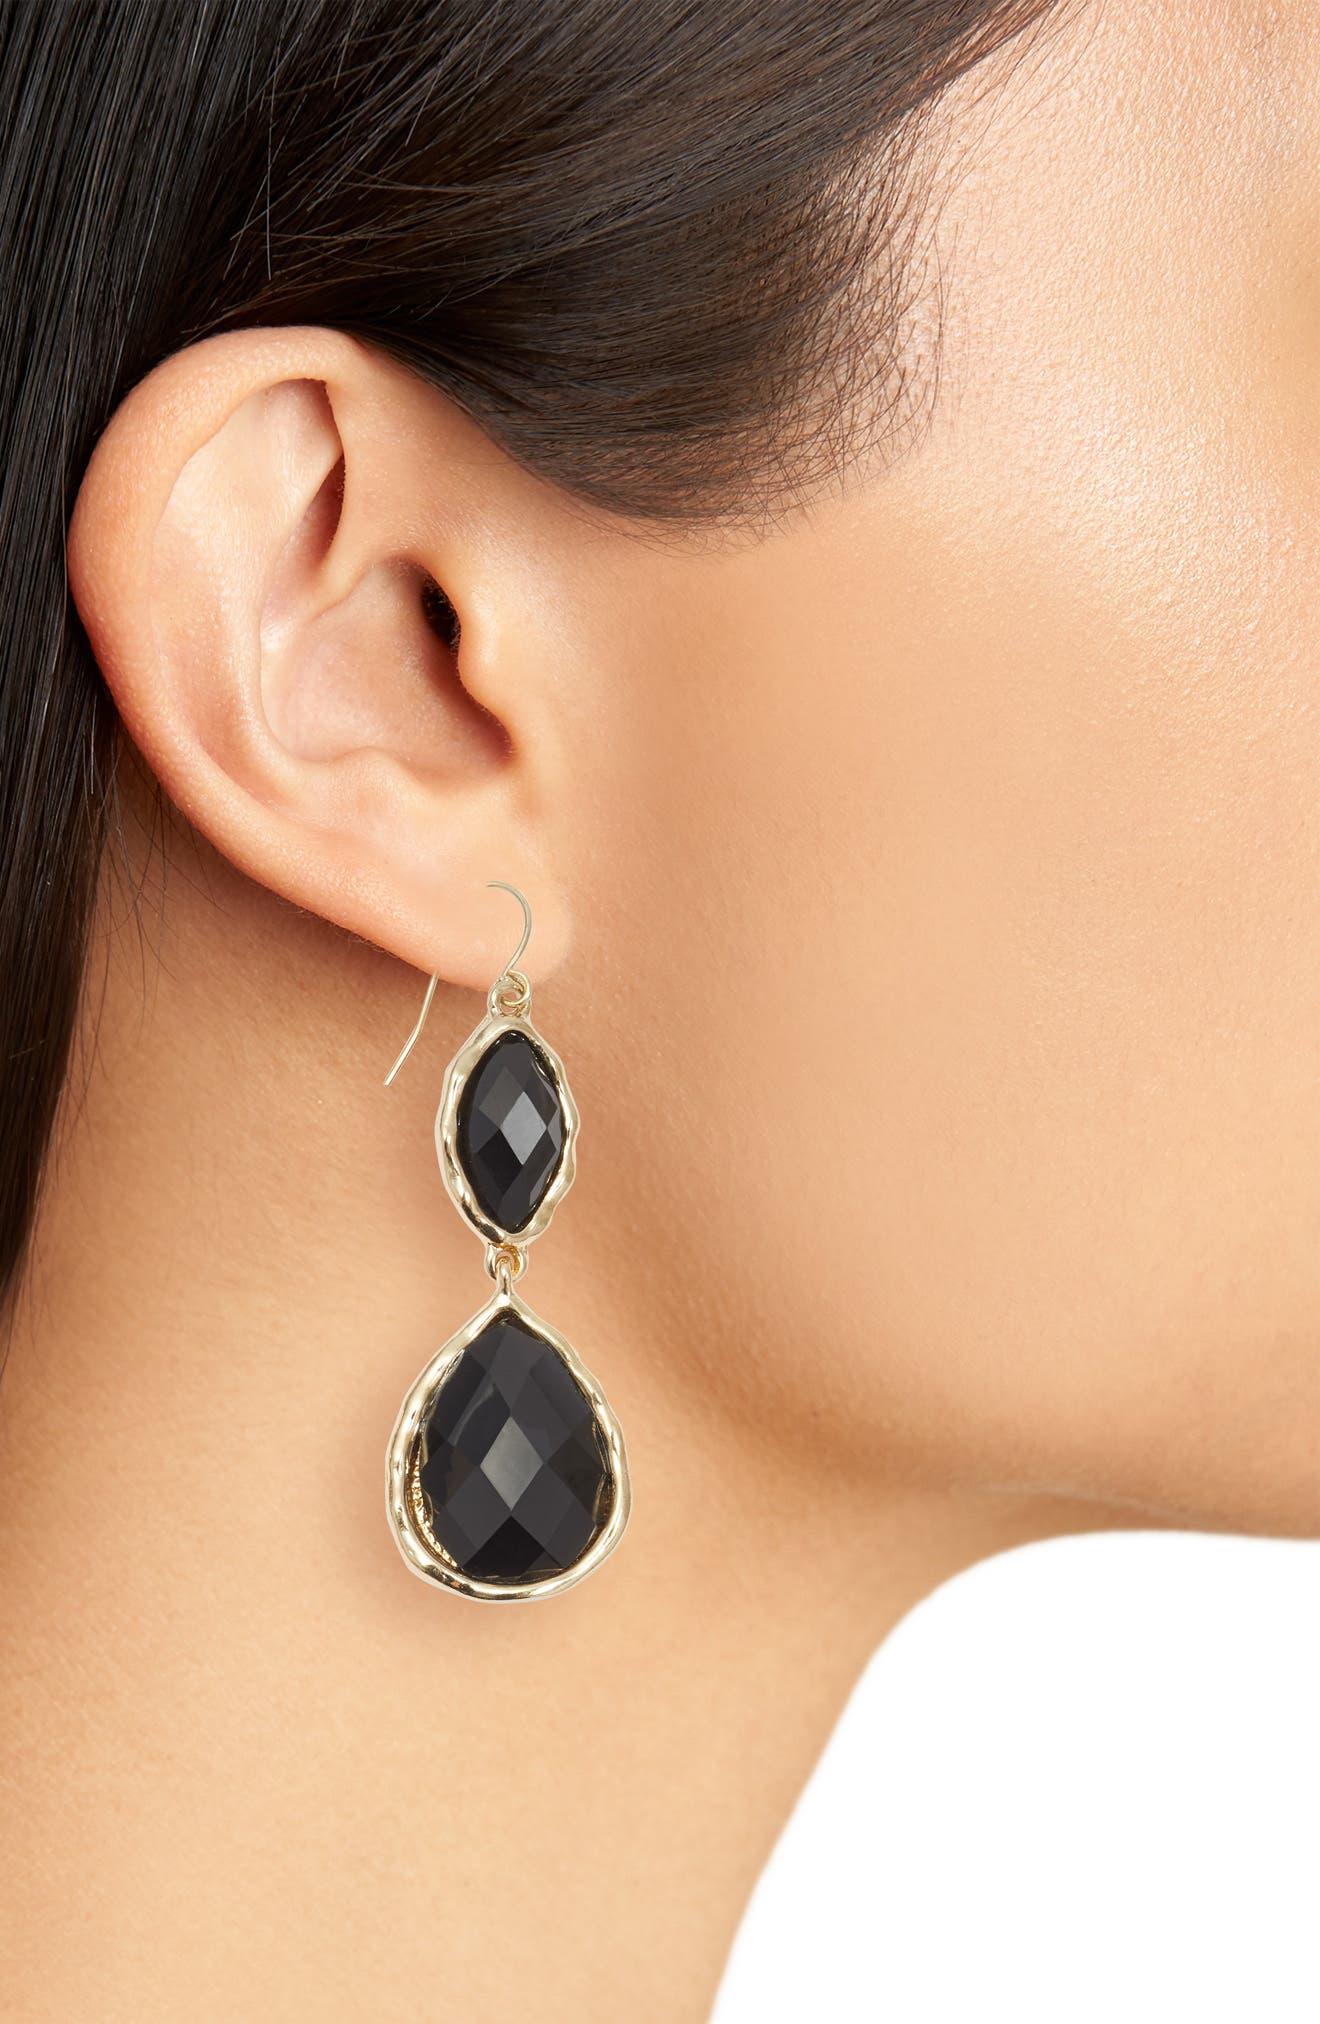 Stone Drop Earrings,                             Alternate thumbnail 2, color,                             Black